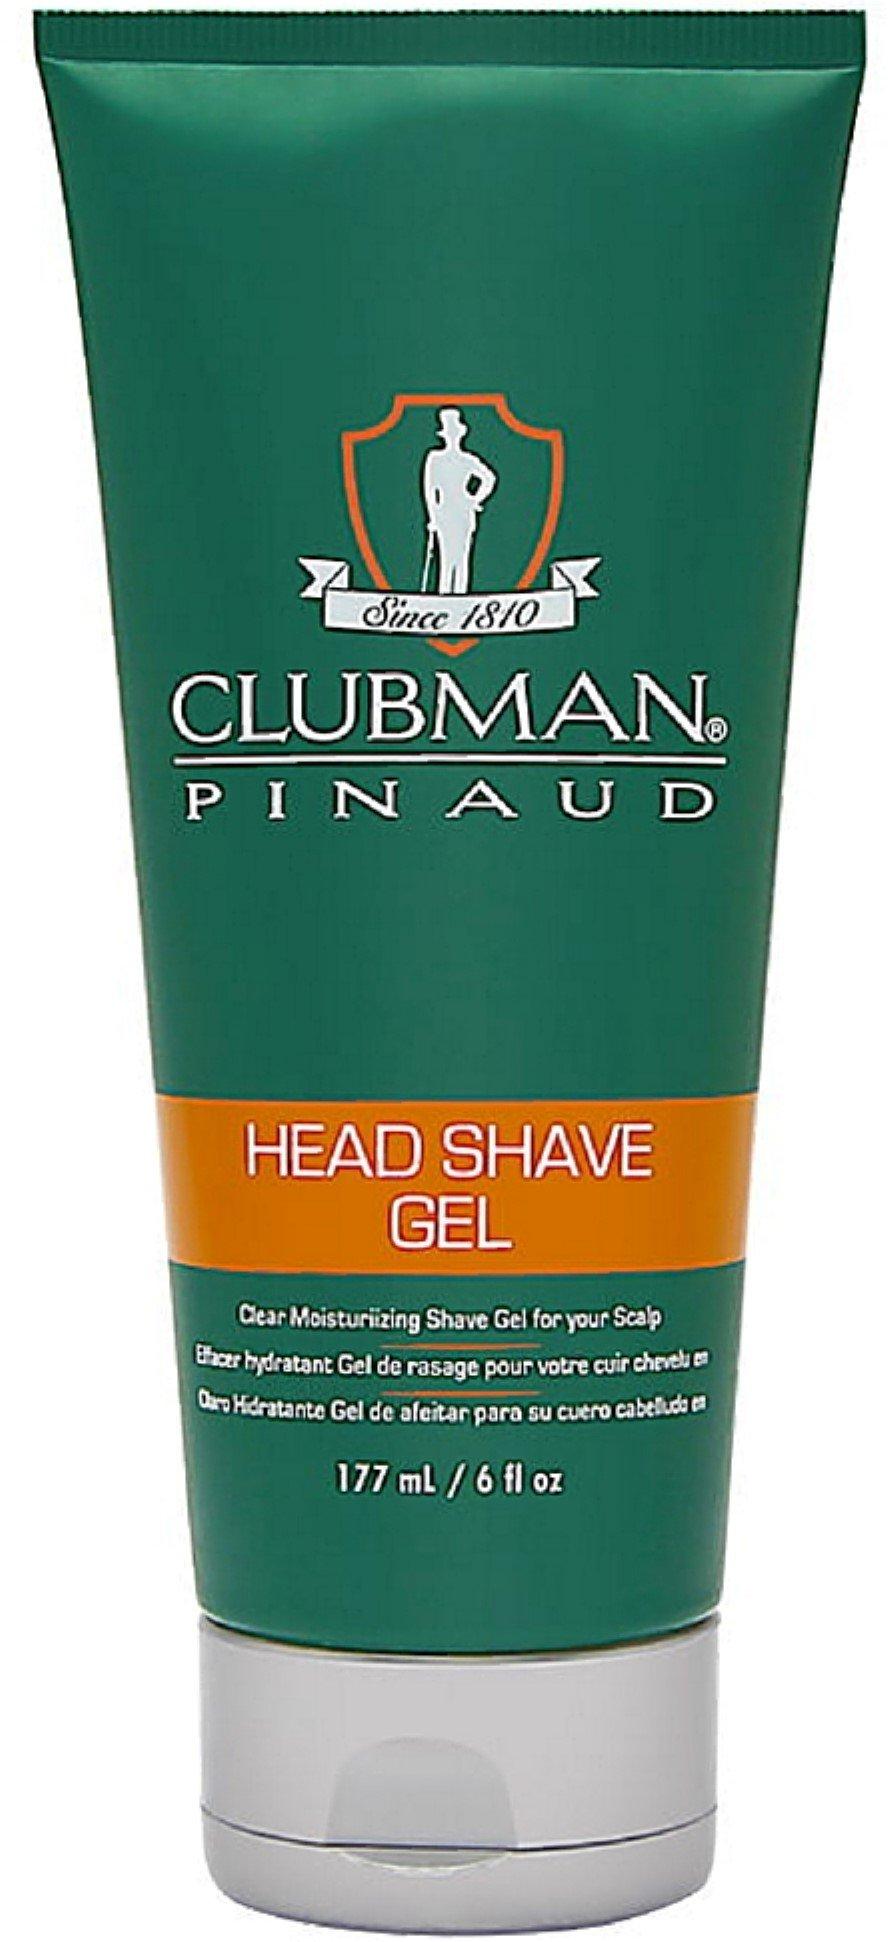 Clubman Pinaud Head Shave Gel 6 oz (Pack of 12)